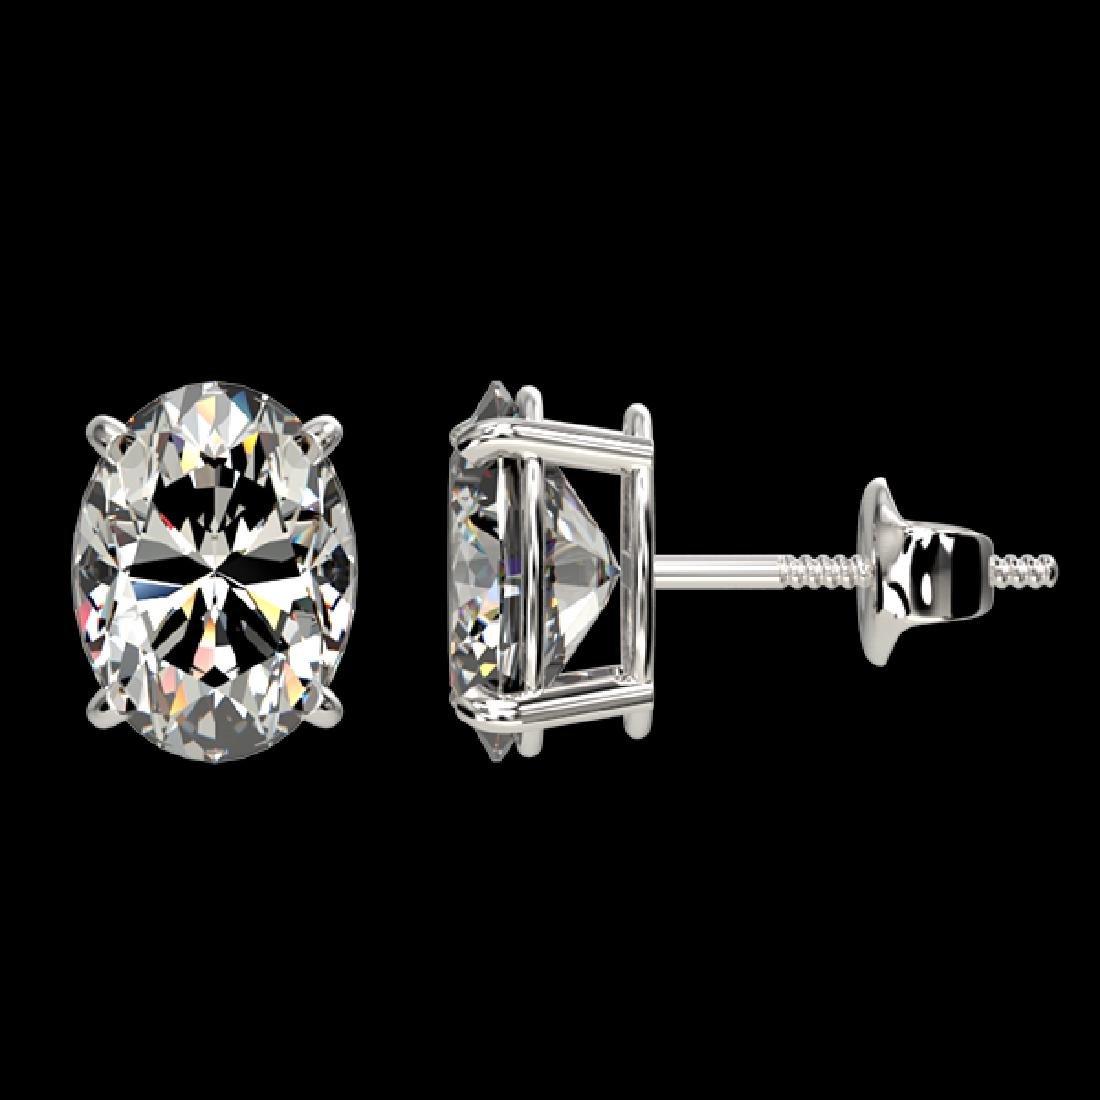 2.50 CTW Certified VS/SI Quality Oval Diamond Stud - 2